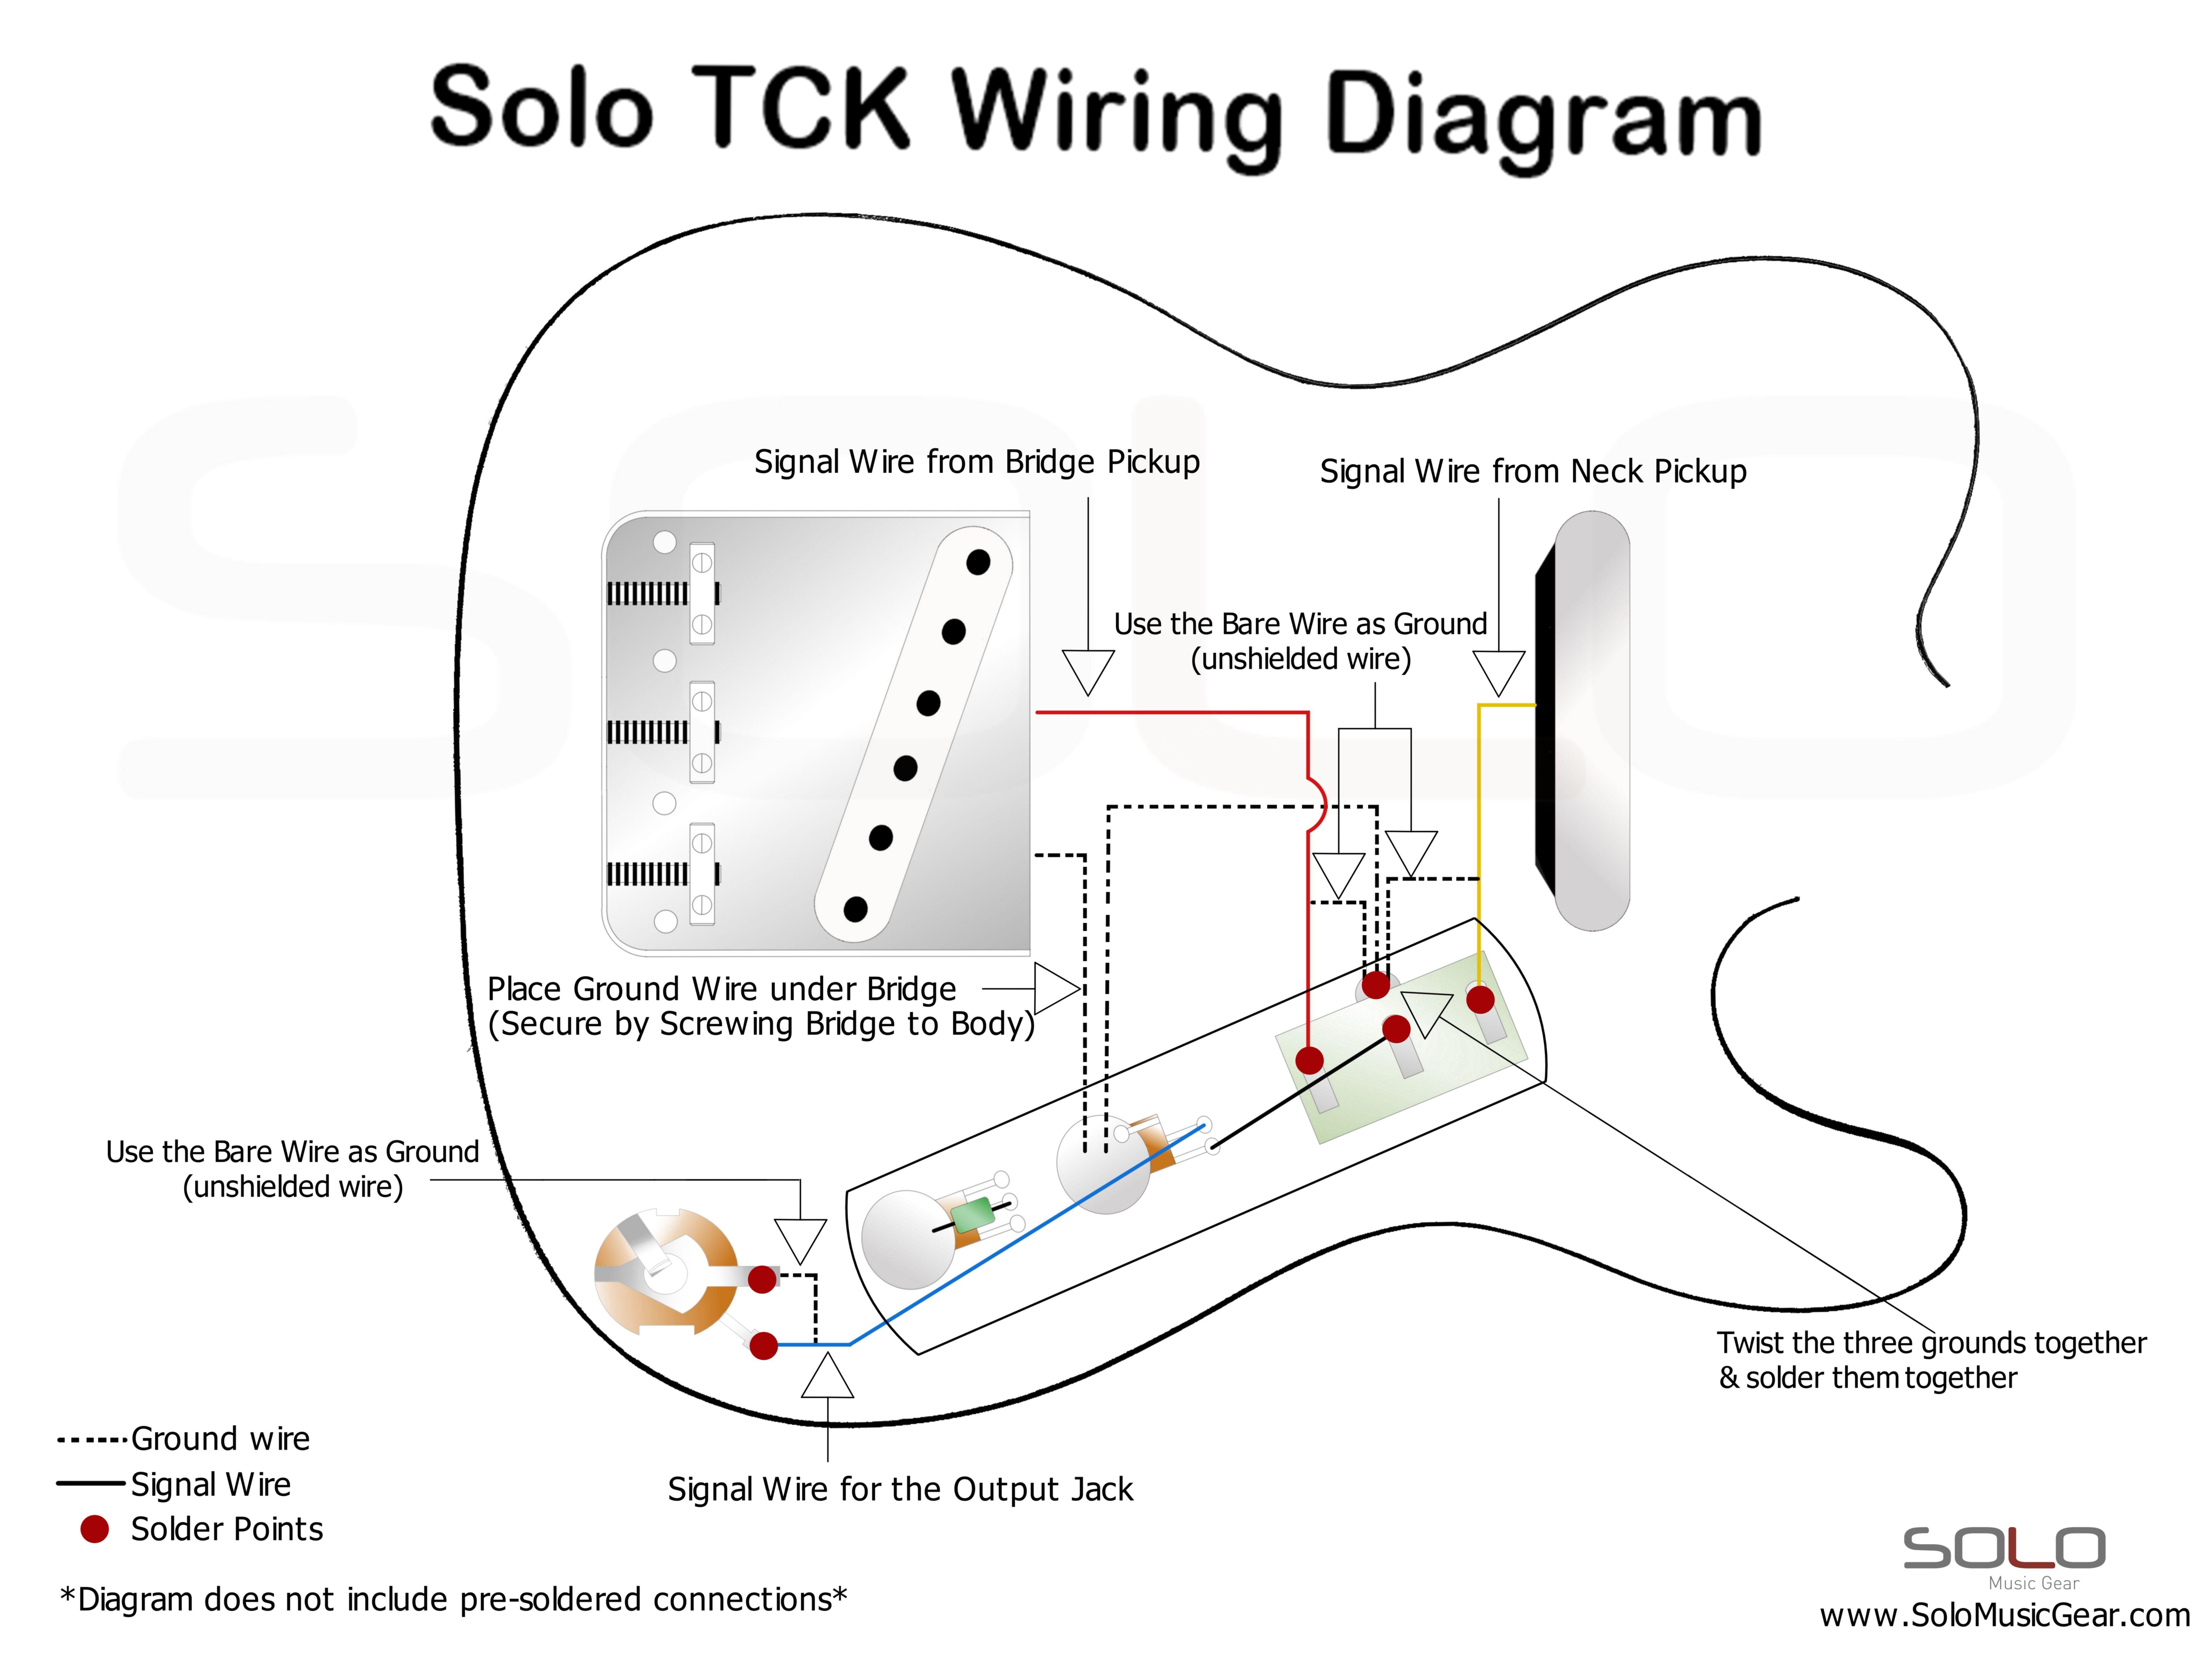 One Input Jack Wiring Diagram Pickup Product Wiring Diagrams \u2022 Wall  Phone Jack Wiring Diagram Barrel Jack Wiring Diagram